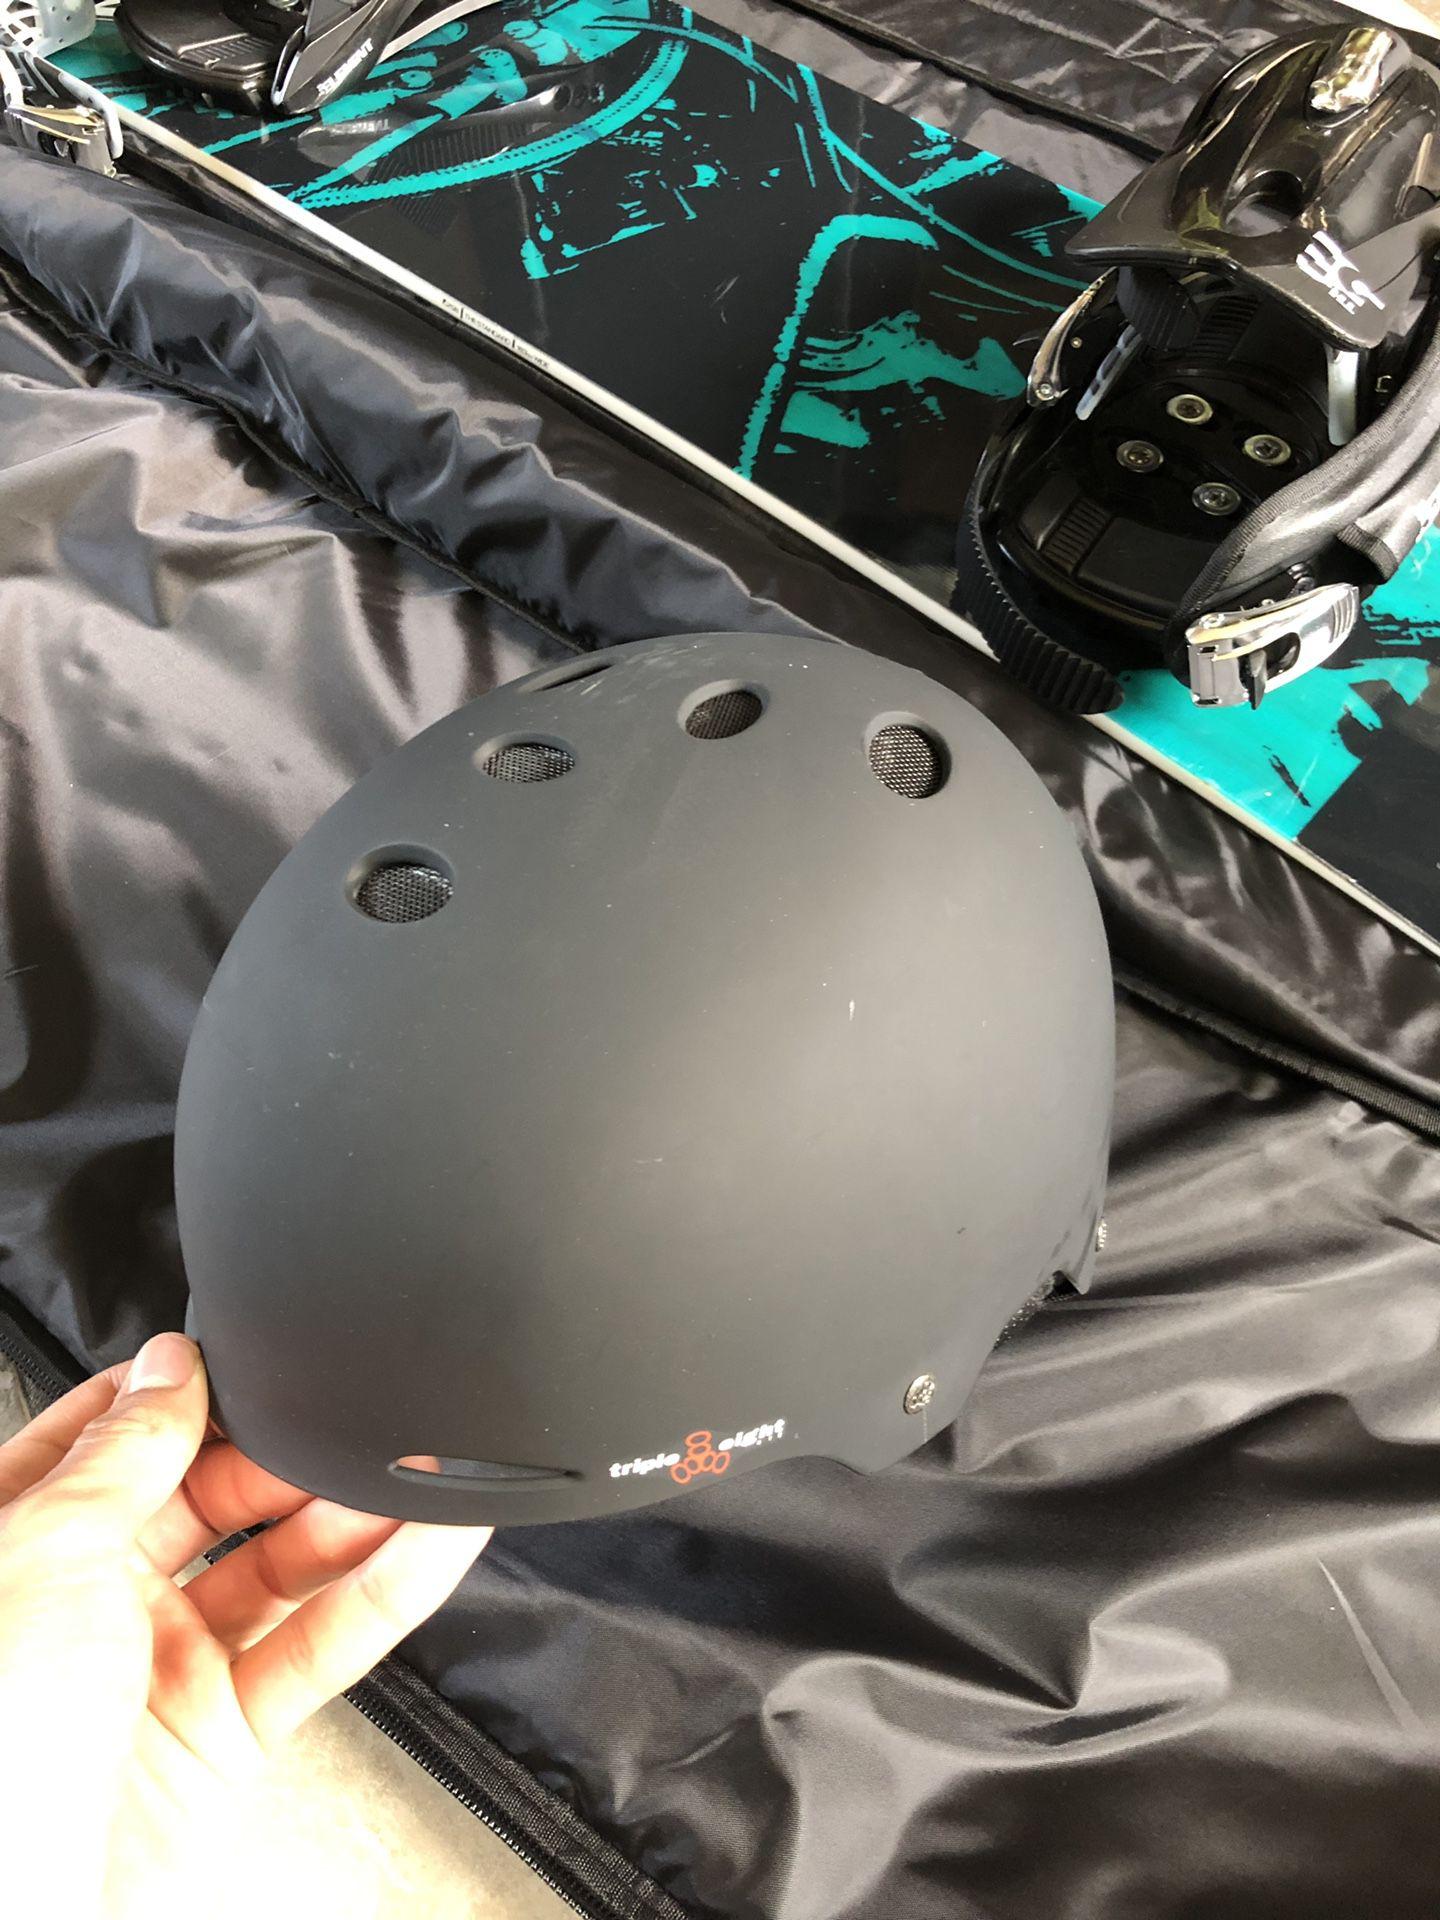 2017 K2 Snowboard 160cm (Element Bindings), Triple EightHelmet (Smith goggles), Demon Snowboard Bag